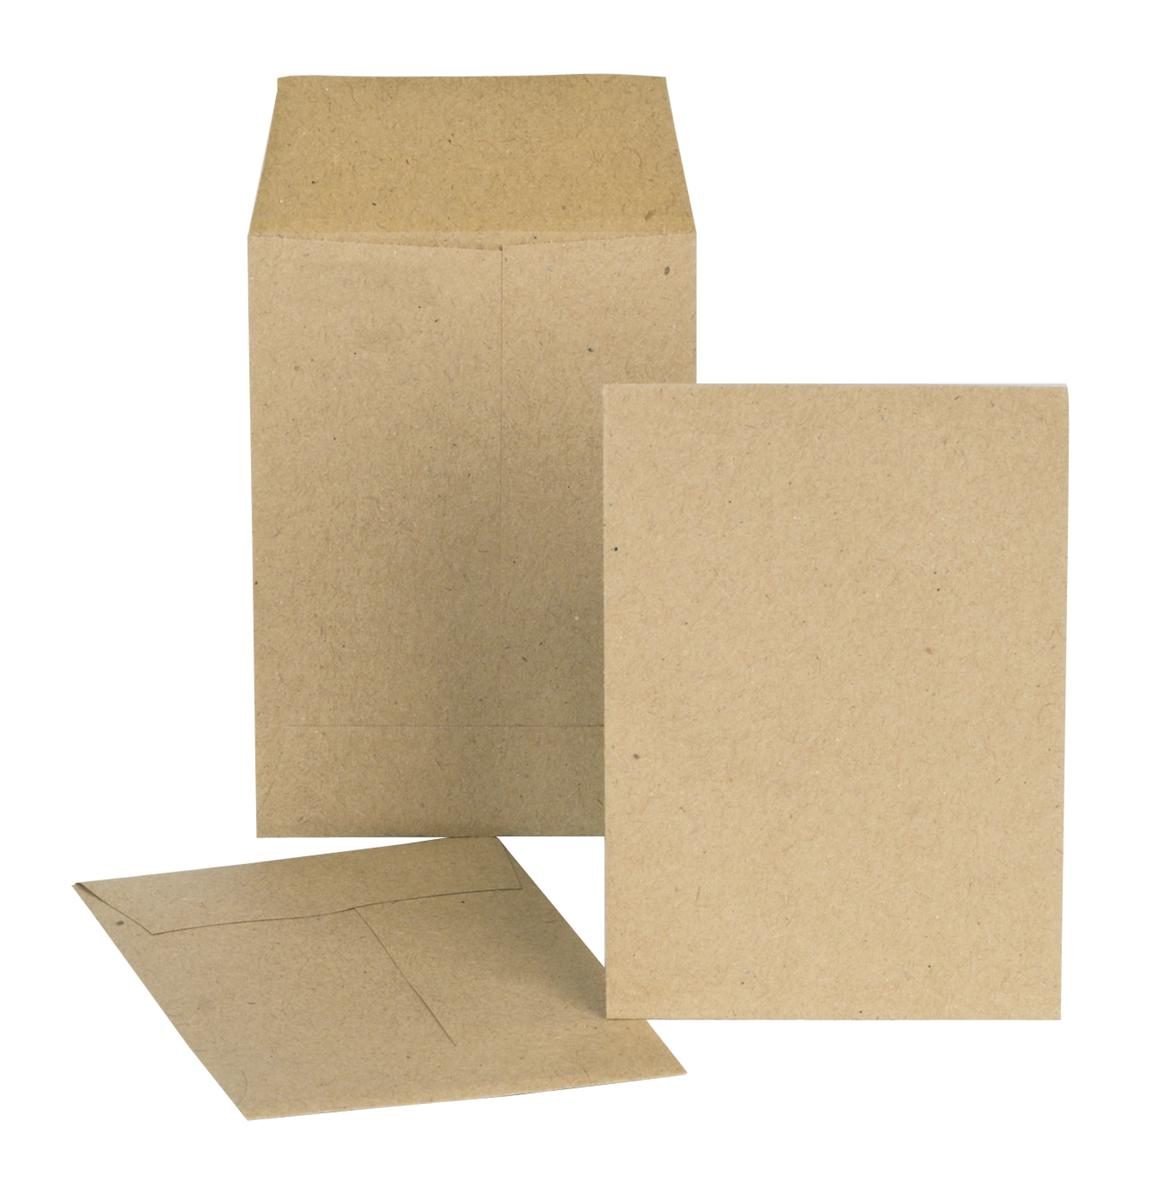 New Guardian Envelopes Lightweight Pocket Gummed 80gsm Manilla 98x67mm [Pack 2000]